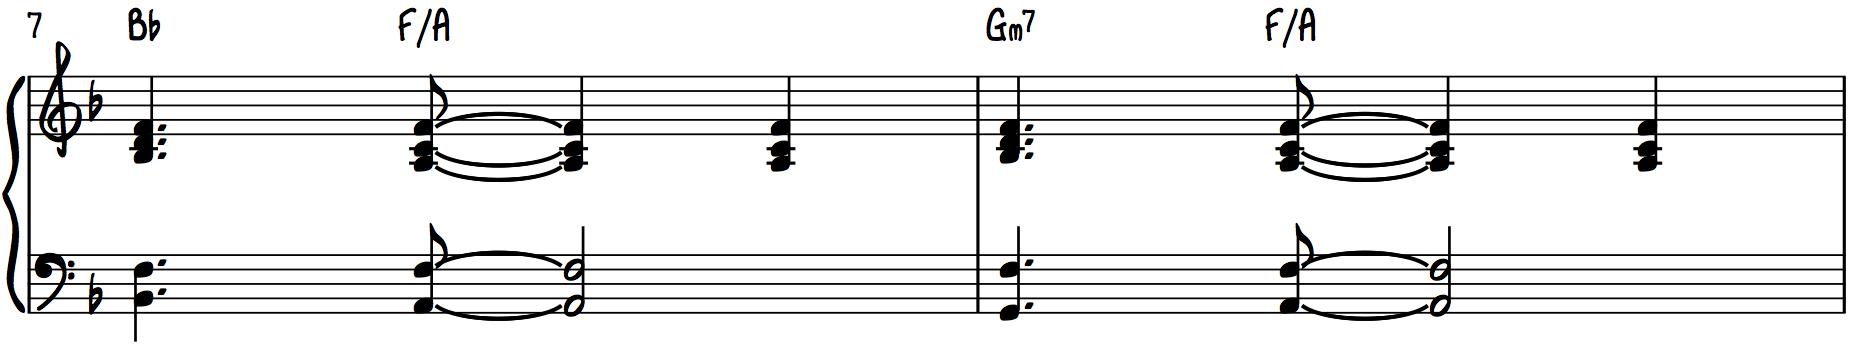 Step 2 Add Chord Substitute iim7 2m7 subdominant walkdown plagal walkdown